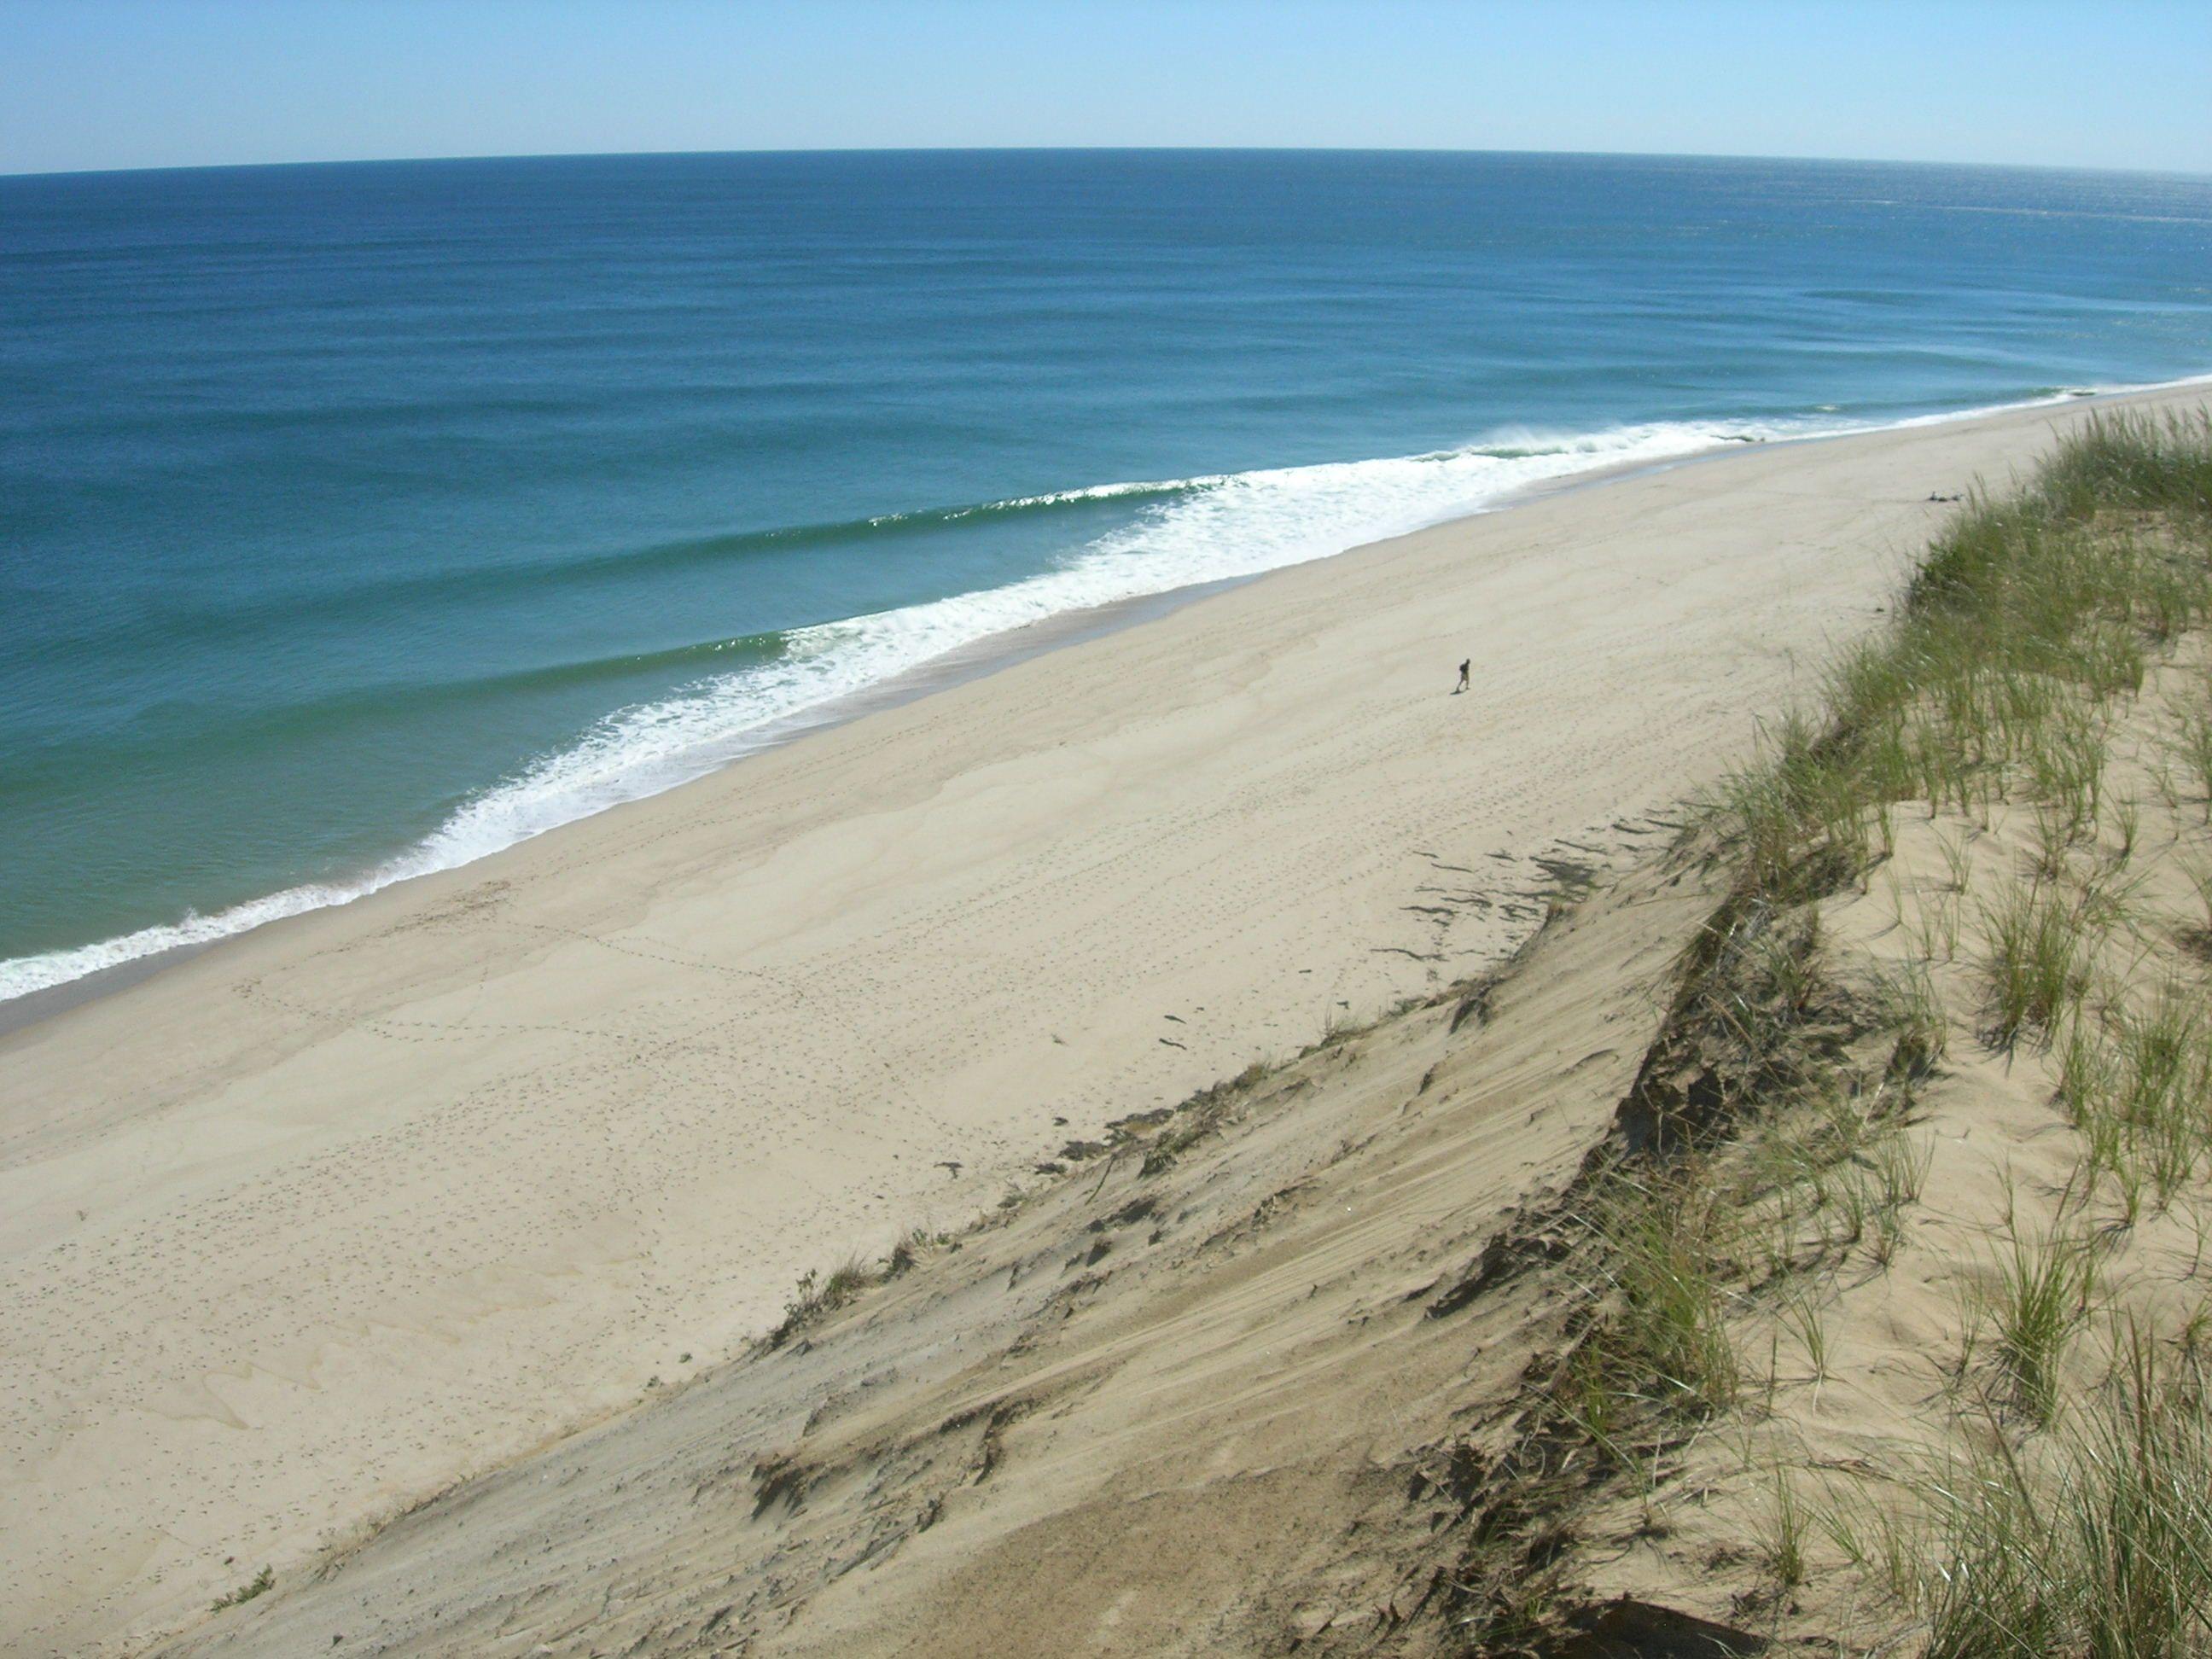 Pin By Christine Fay On I Ve Swum Here I Swam Here I Ve Been Swimming Here Whew Cape Cod Truro Beach